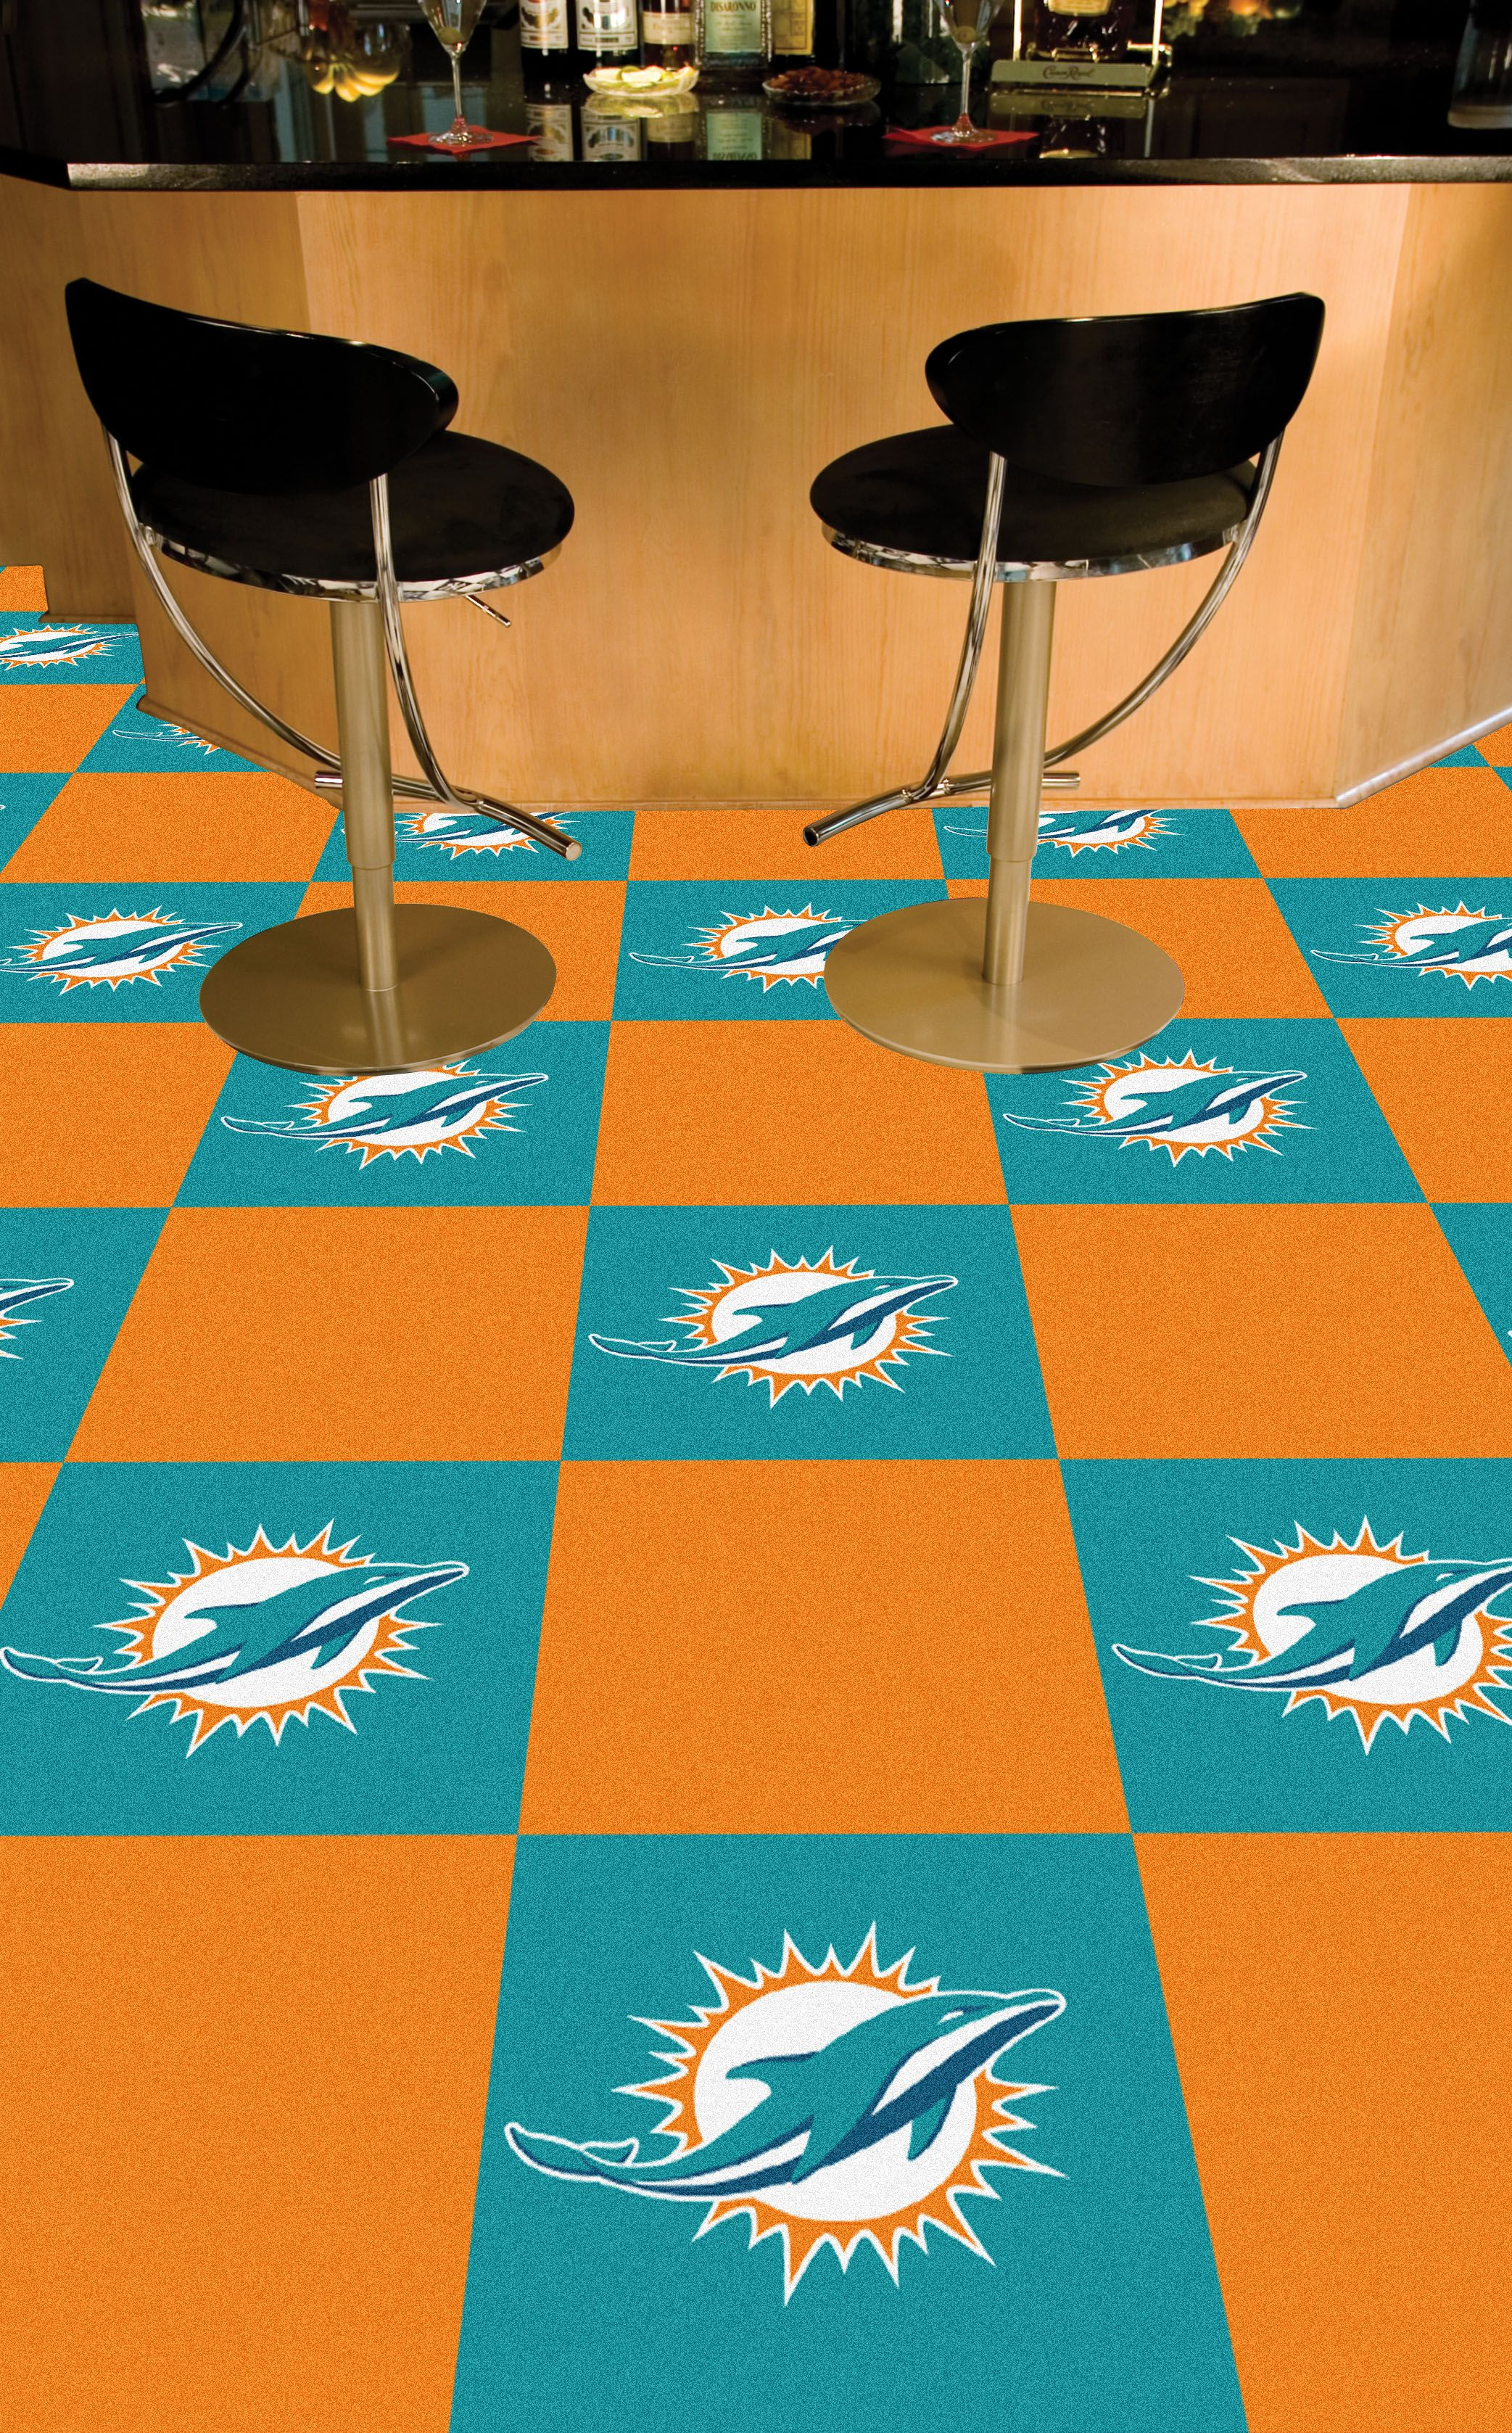 NFL Miami Dolphins Carpet Tiles